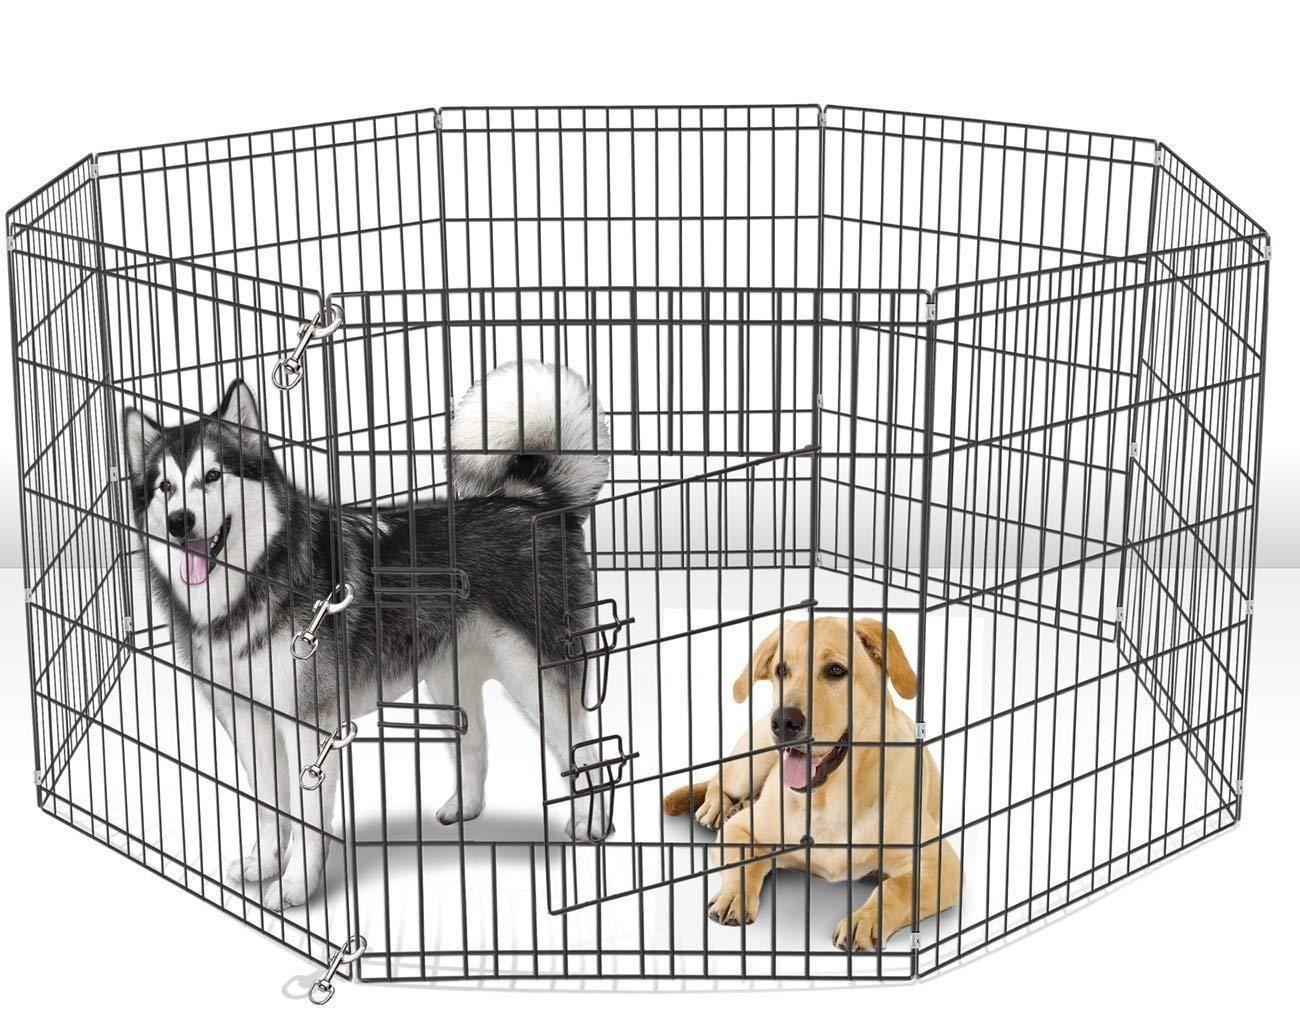 36 Dog Kennel Outdoor Pet Play Pen Cat Rabbit Cage 8 Panels Heavy